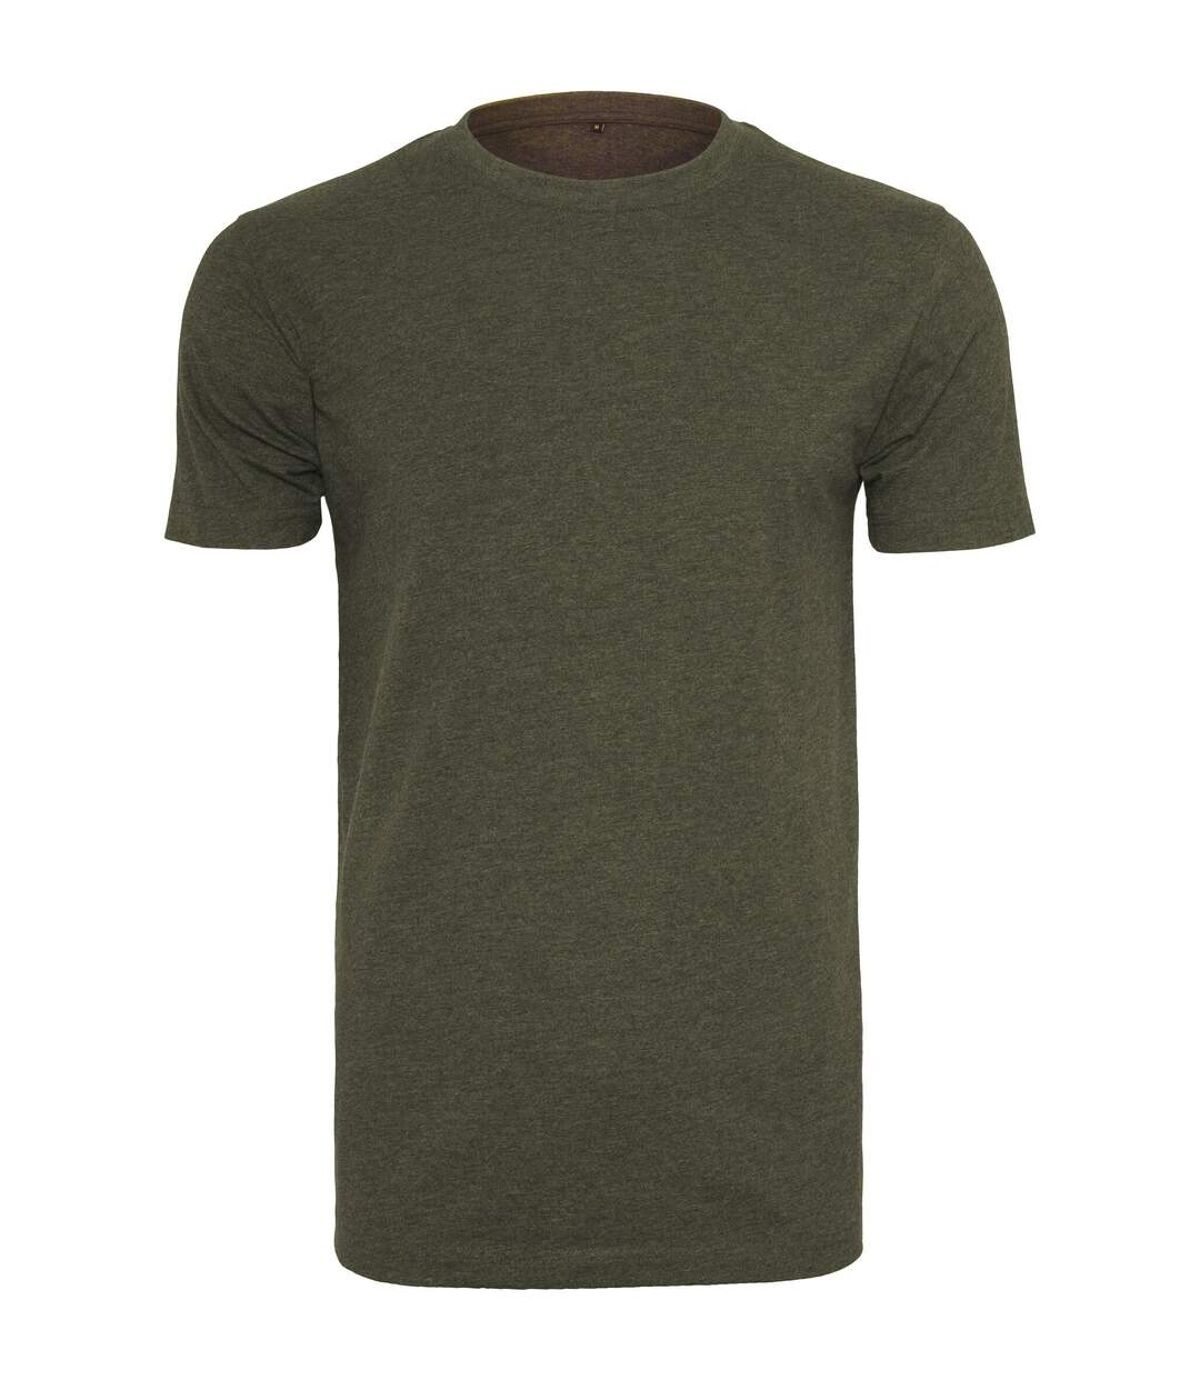 Build Your Brand Mens T-Shirt Round Neck (Olive) - UTRW5815